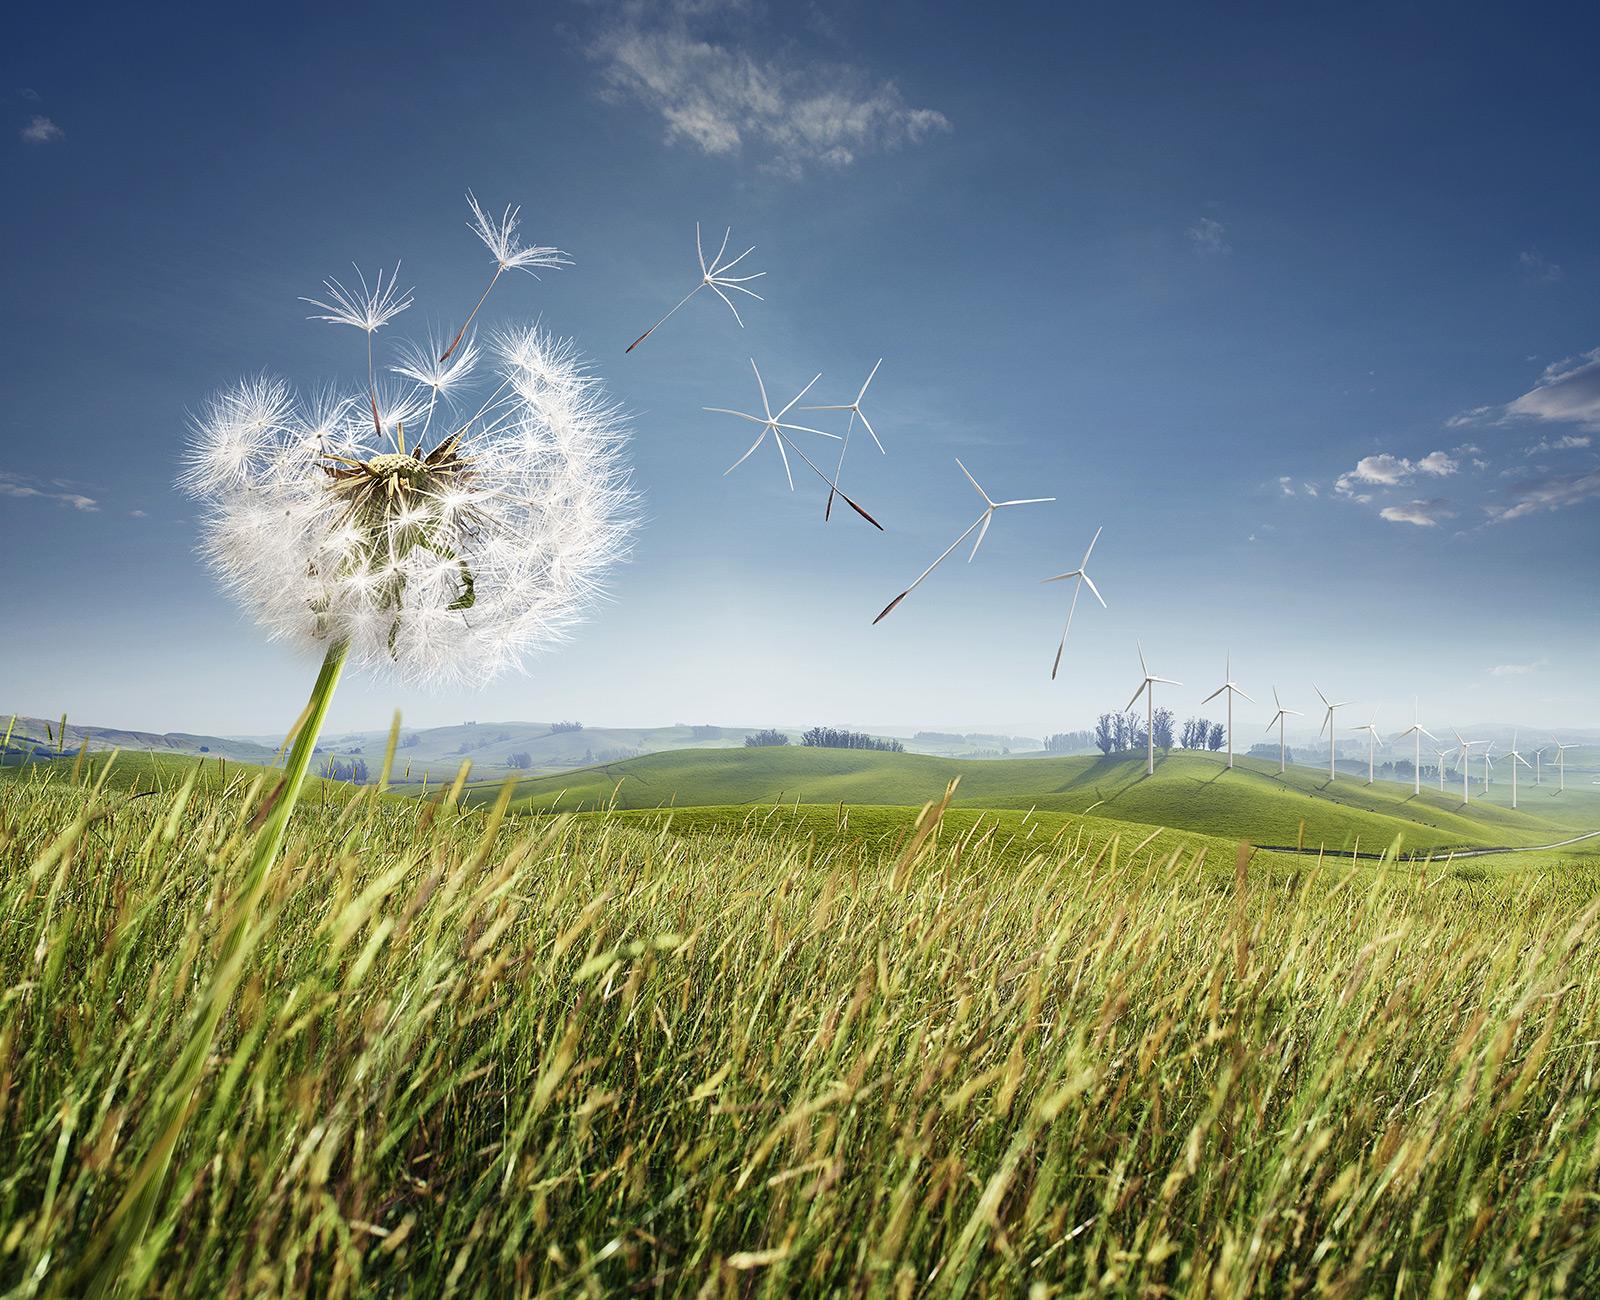 """Harmony with nature"", un projet de photomanipulation qui rafraîchit !"